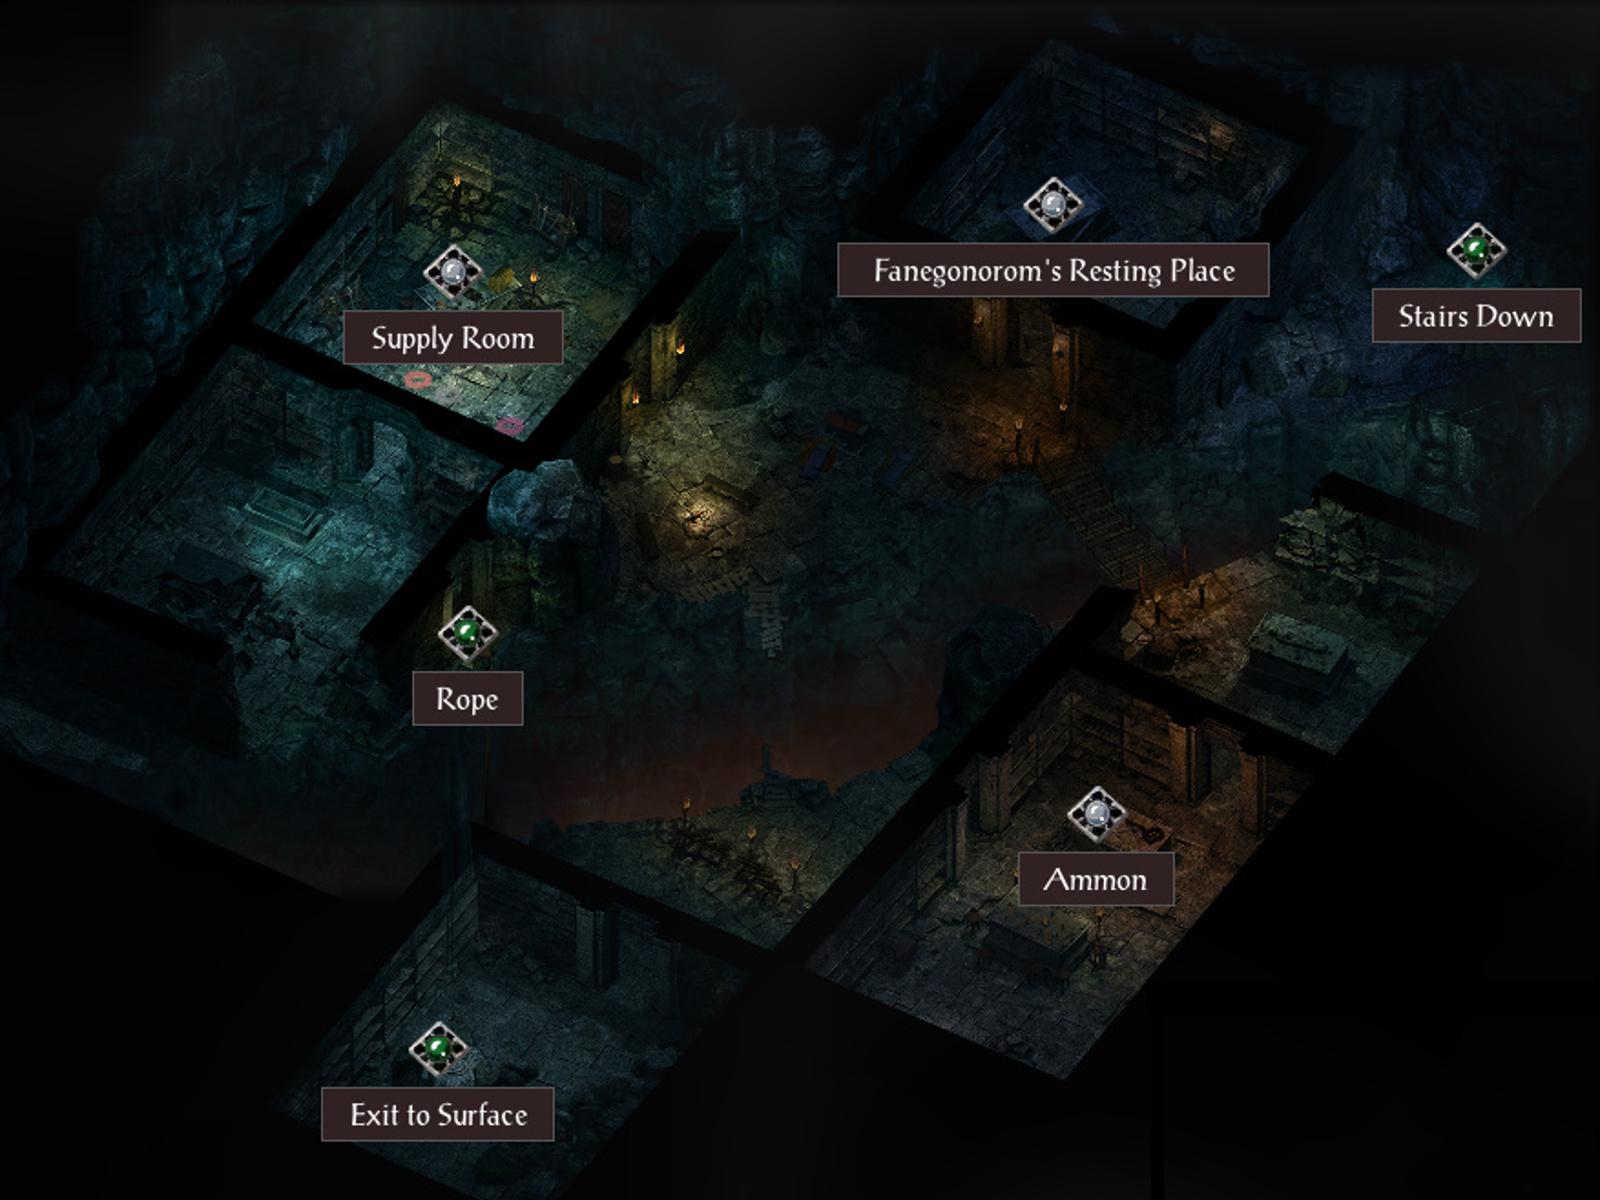 ogre cave temple elemental evil cheat